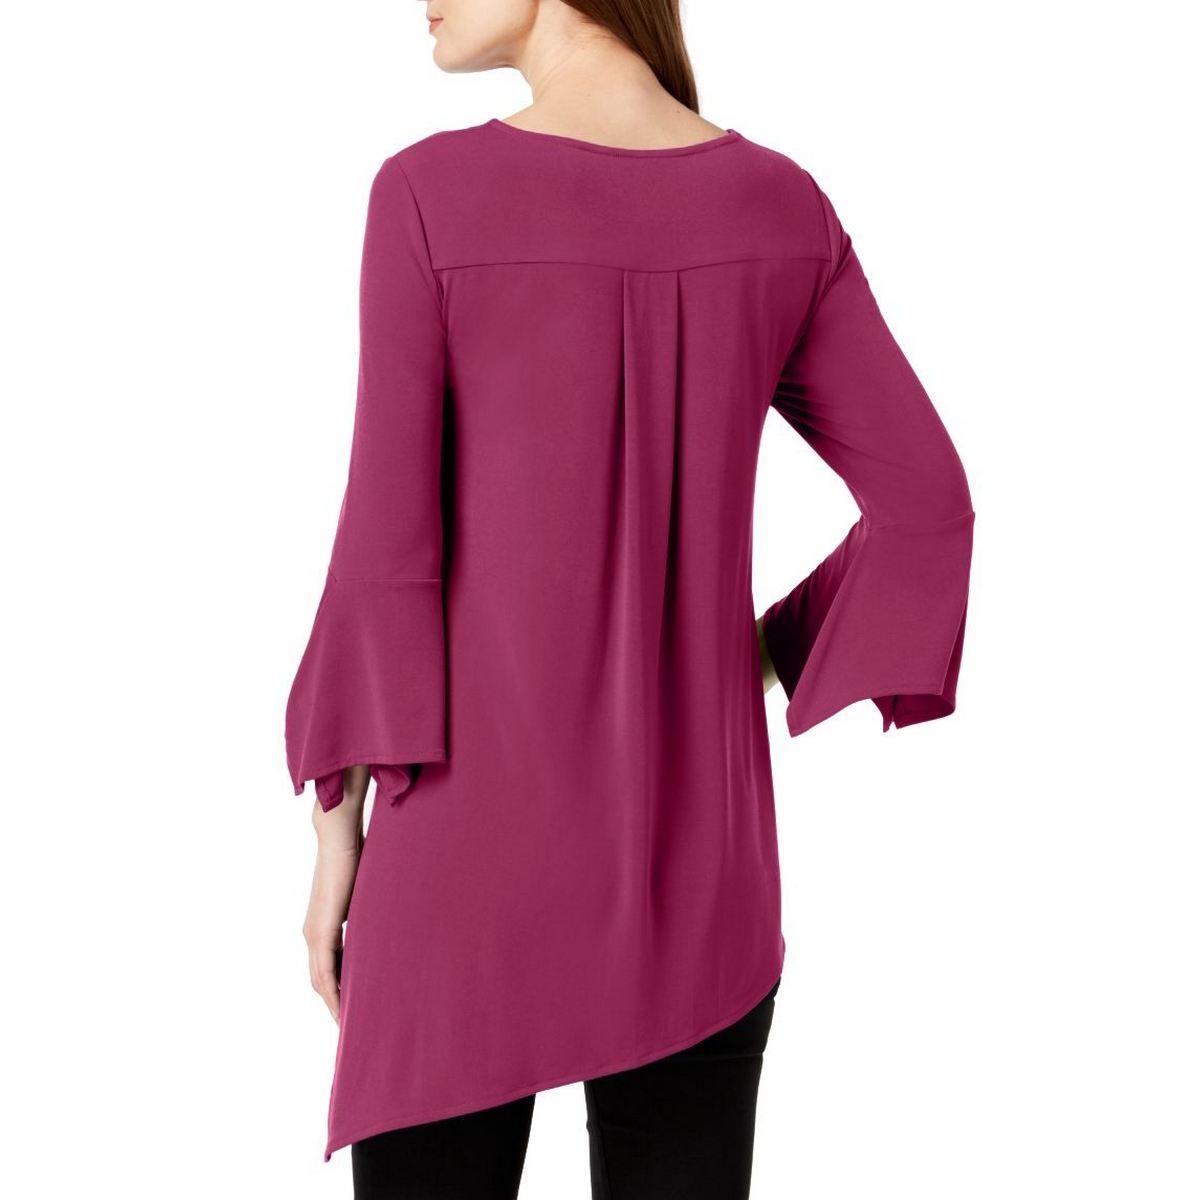 ALFANI-NEW-Women-039-s-Square-Sleeve-Asymmetrical-Blouse-Shirt-Top-TEDO thumbnail 4